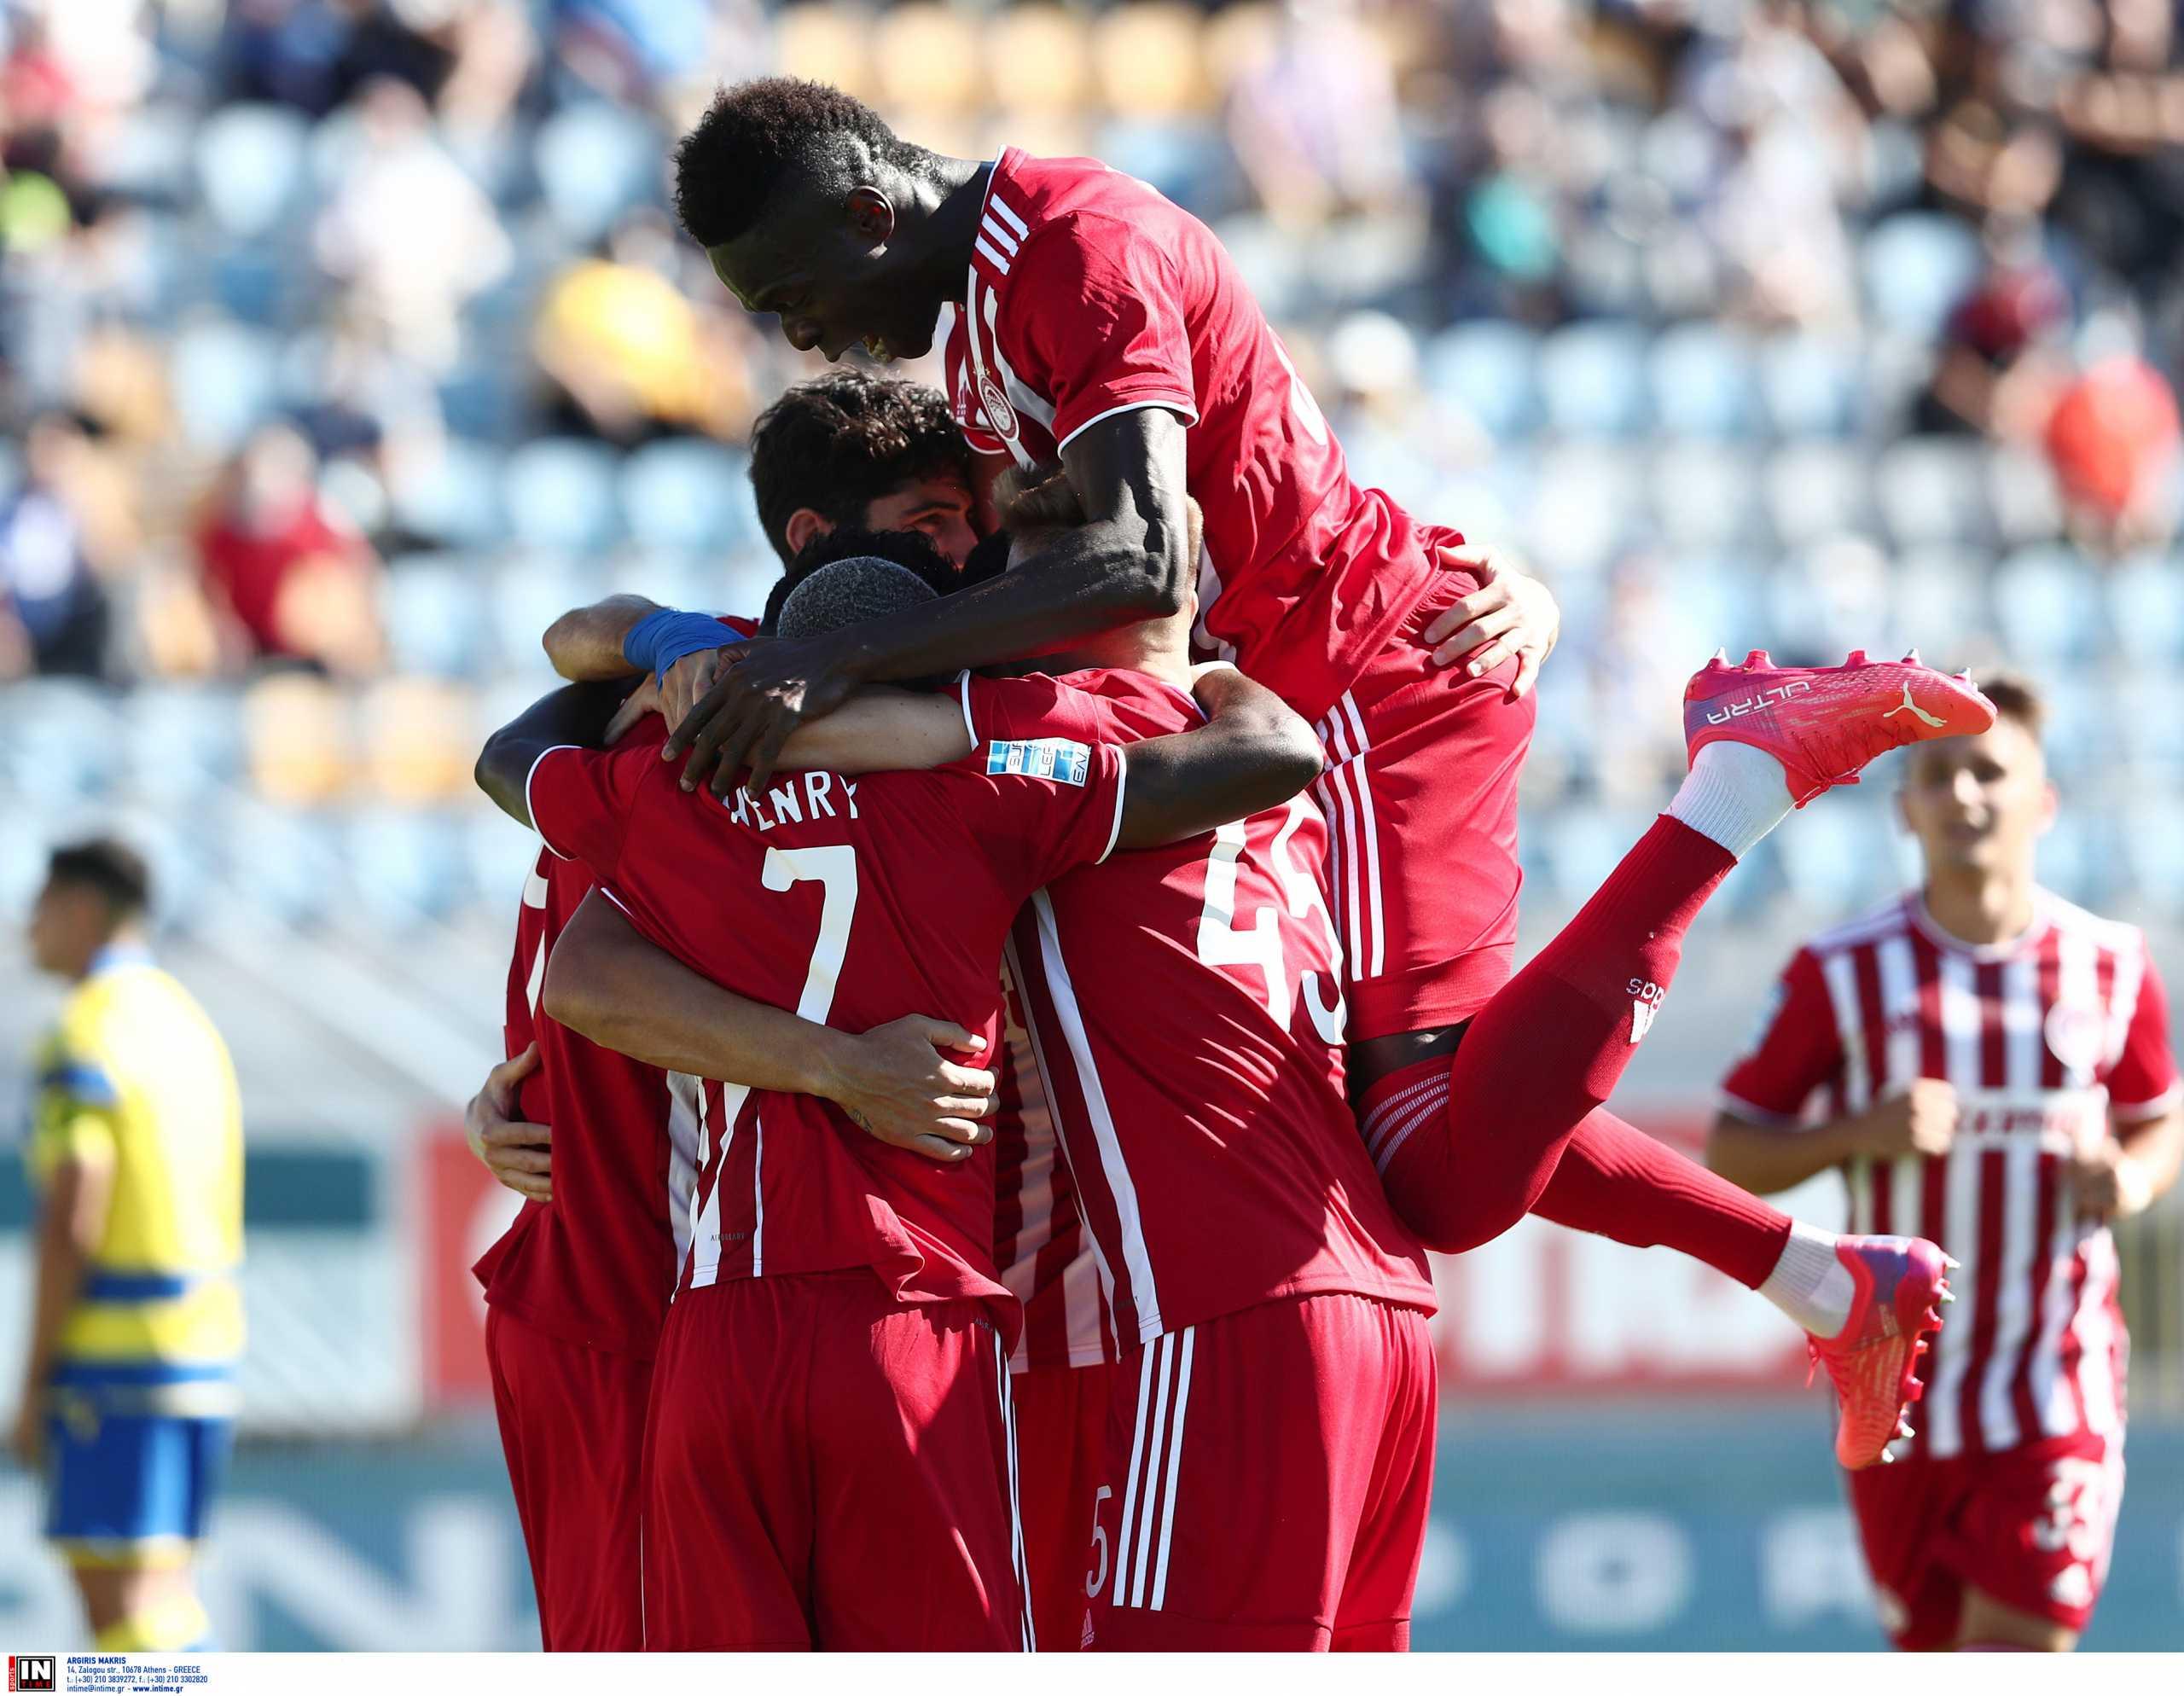 Superleague 1, Αστέρας Τρίπολης – Ολυμπιακός 0-2: Επαγγελματική νίκη πριν τη μάχη με τη Φενέρμπαχτσε